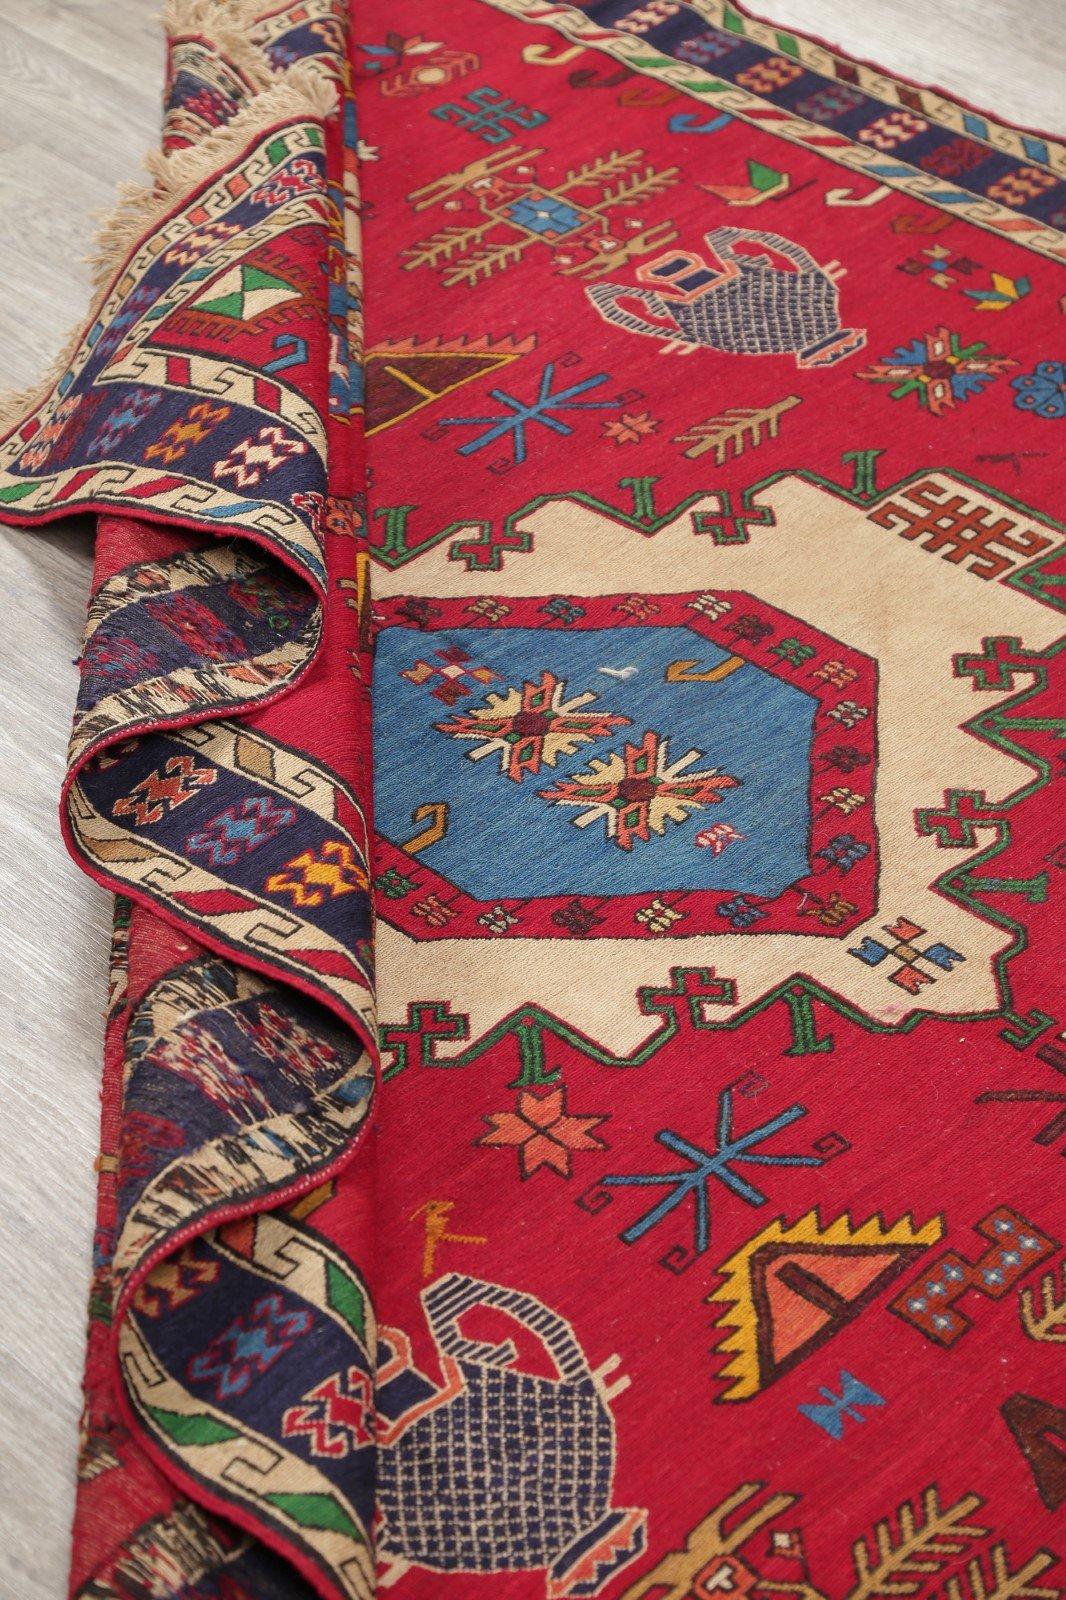 Hand-Woven Red Geometric Soumack Kilim Kazak Persian Area Rug Wool 7x10